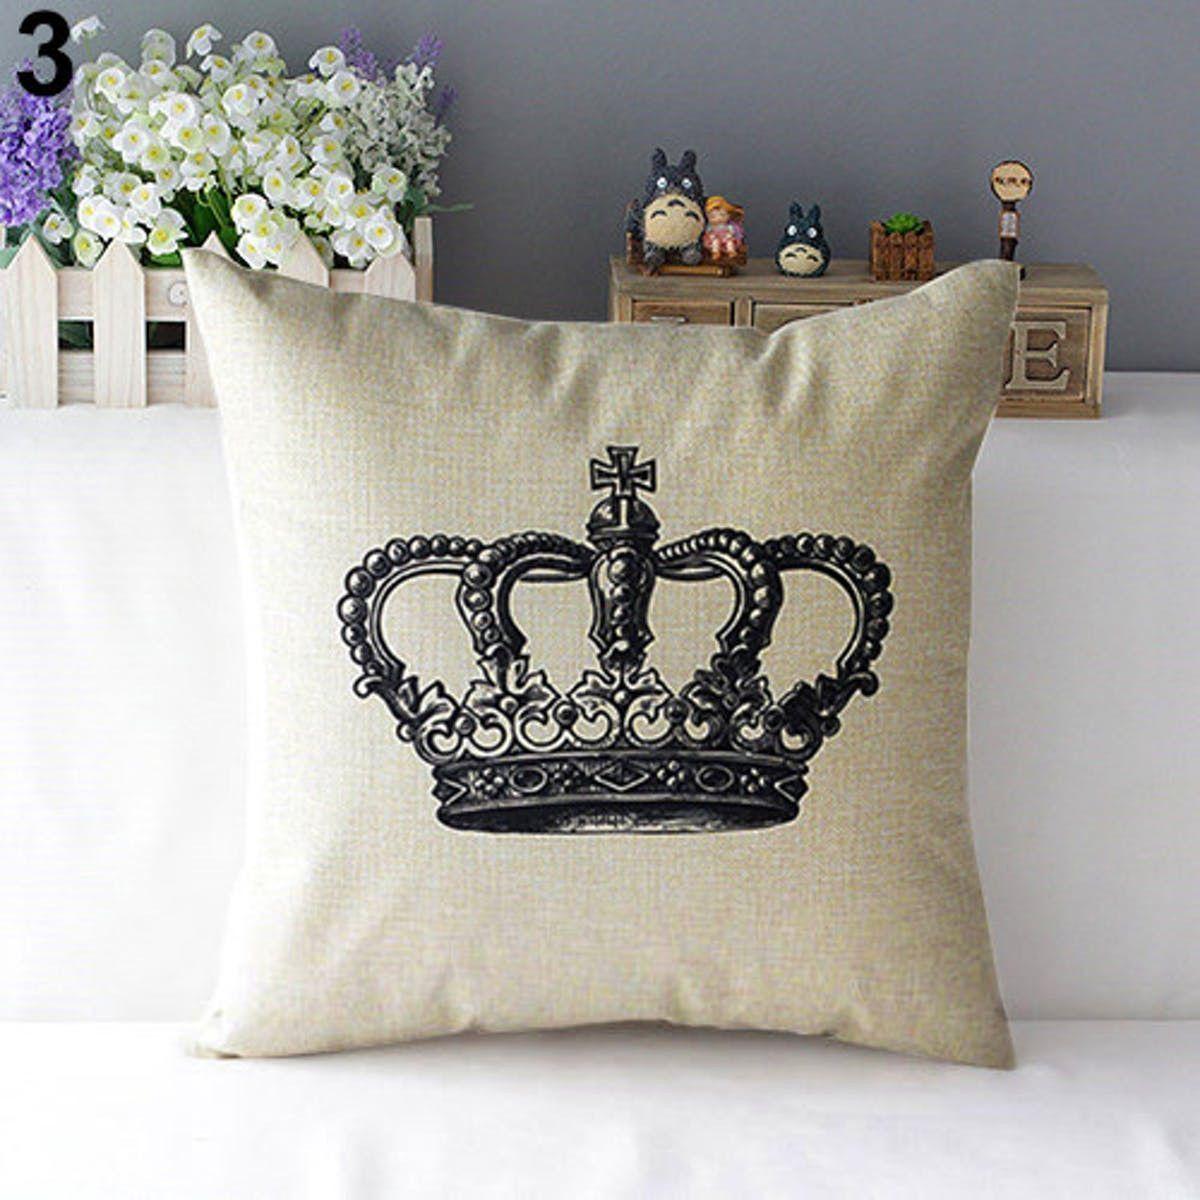 Stunning Ideas Decorative Pillows On Sofa Floors Decorative